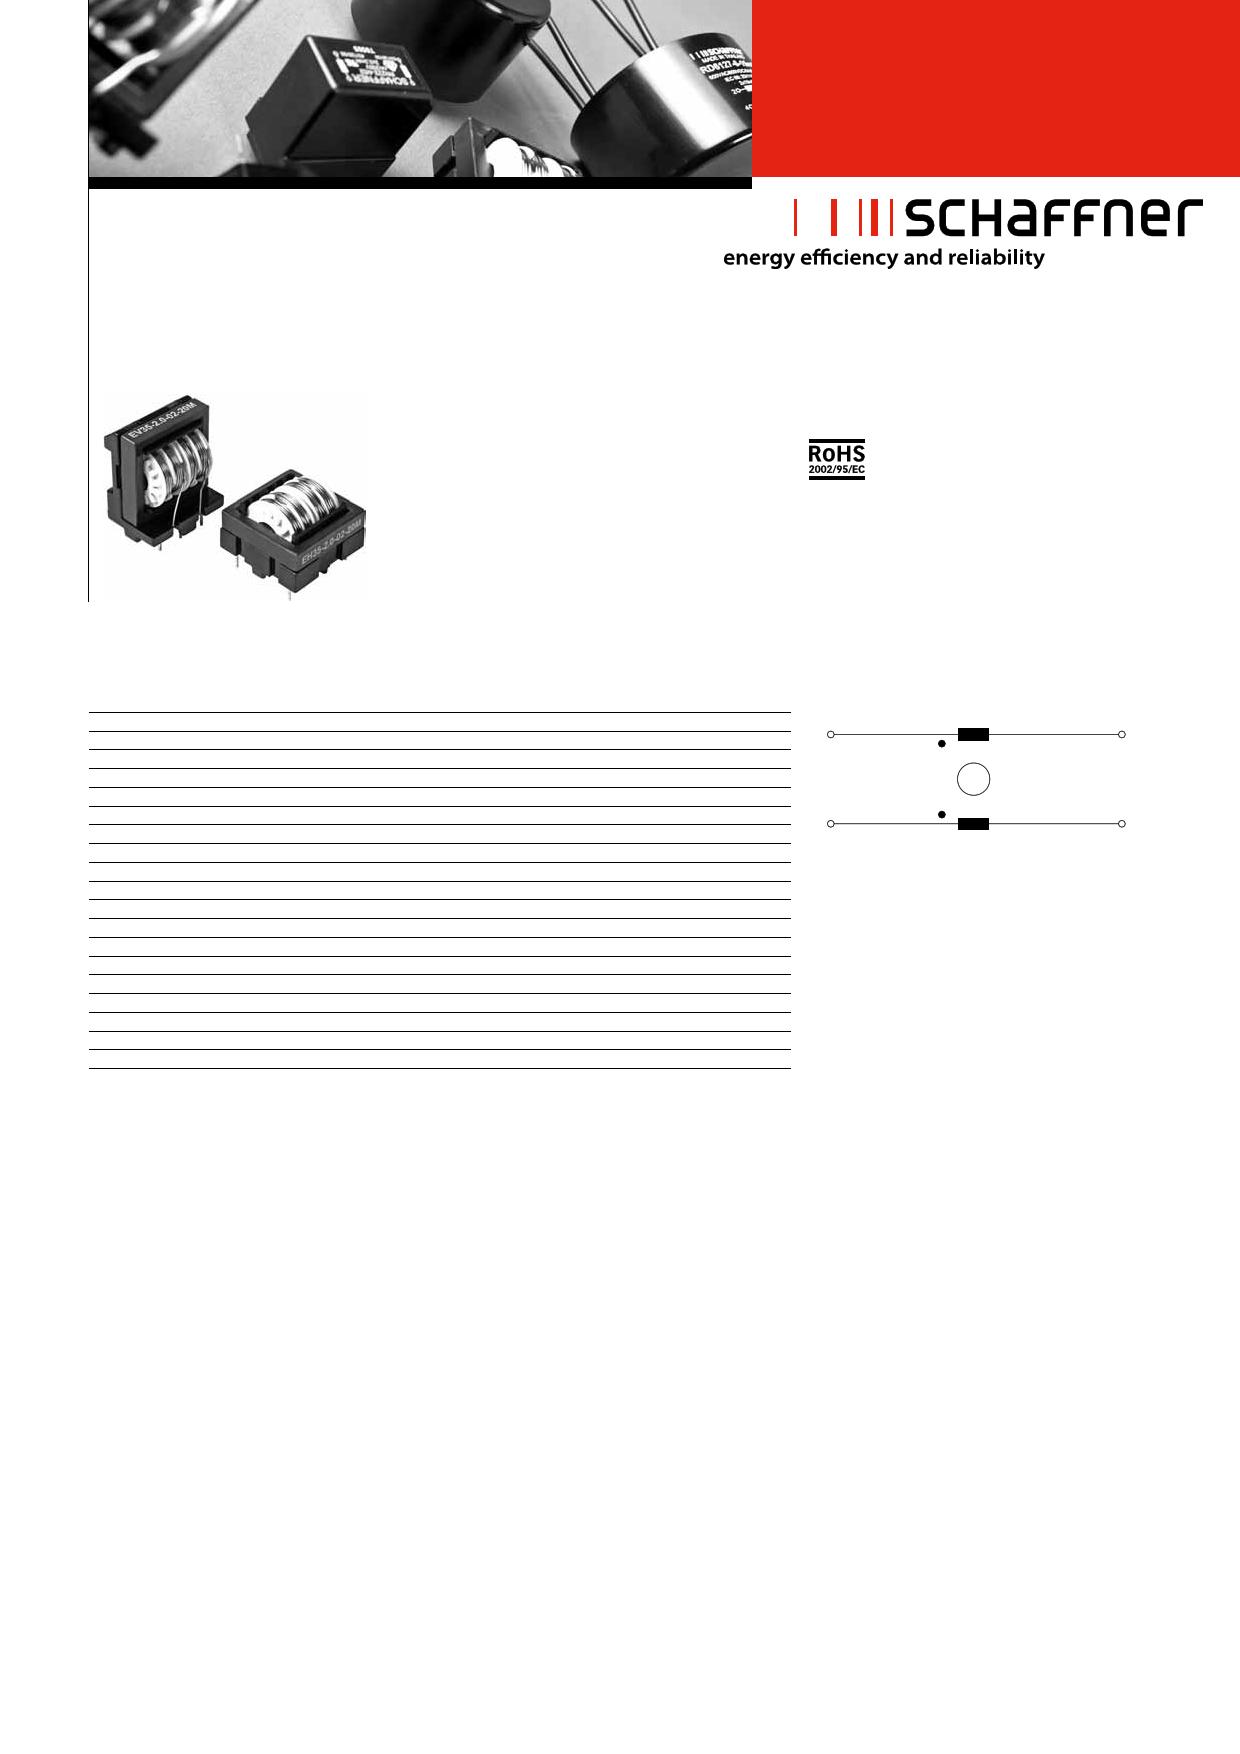 EH20-1.5-02-1M8 datasheet